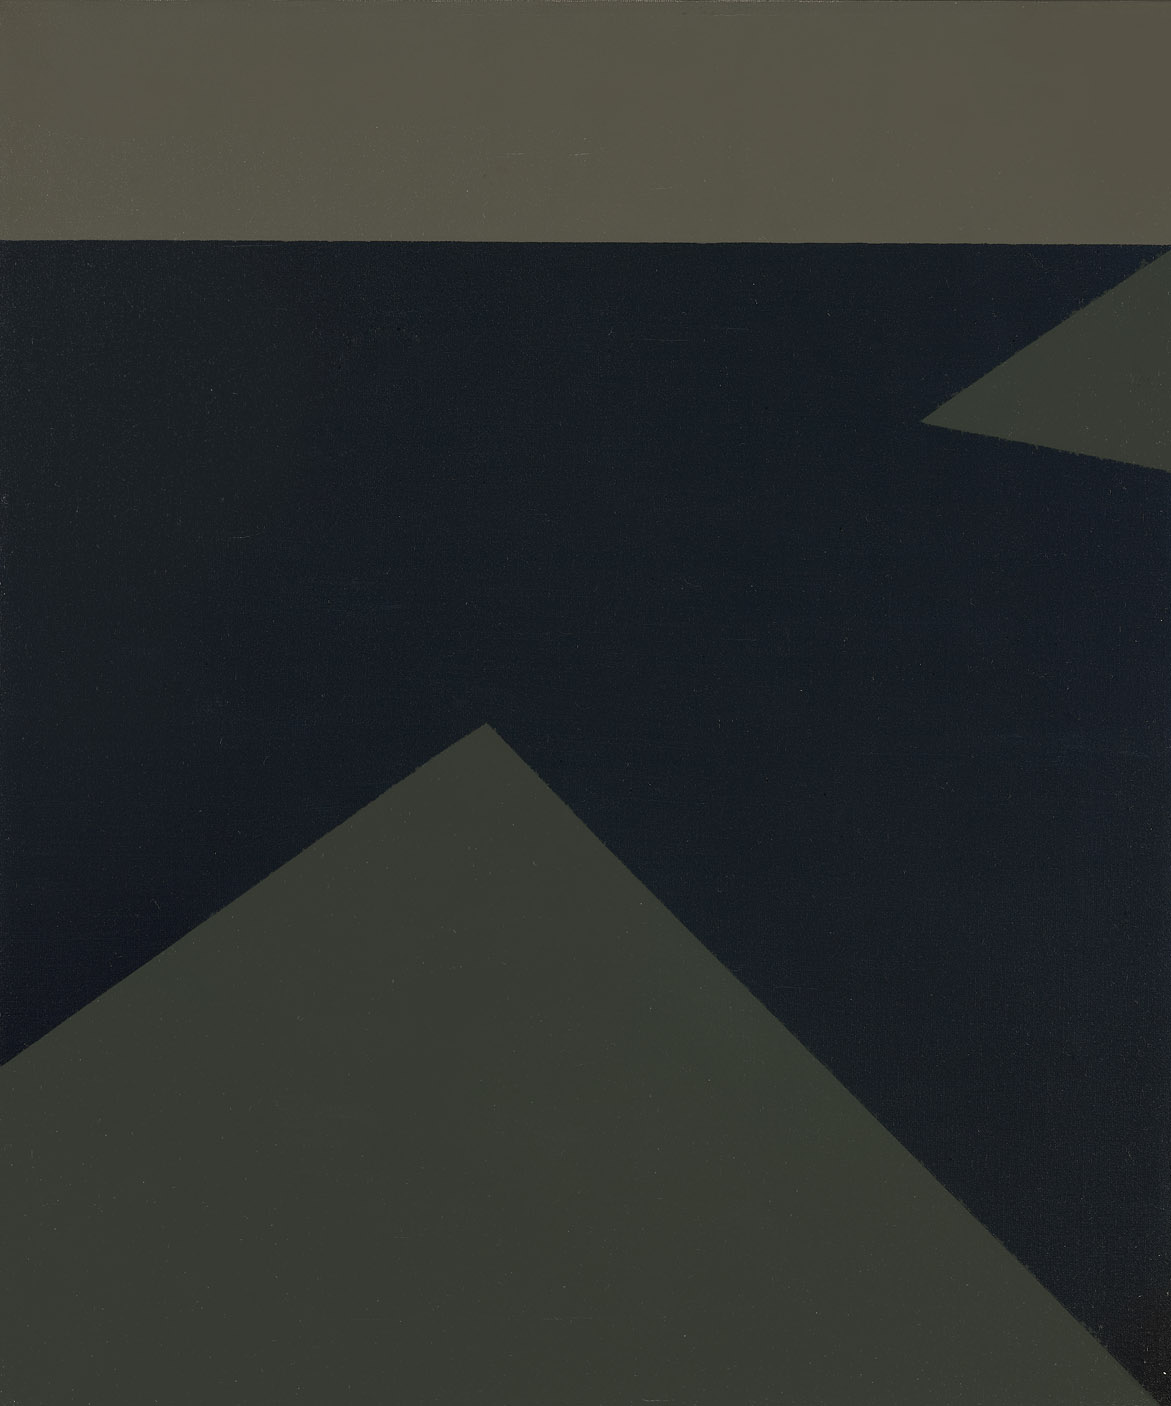 Estuary , 1960  oil on canvas 24 x 20 inches; 61 x 50.8 centimeters